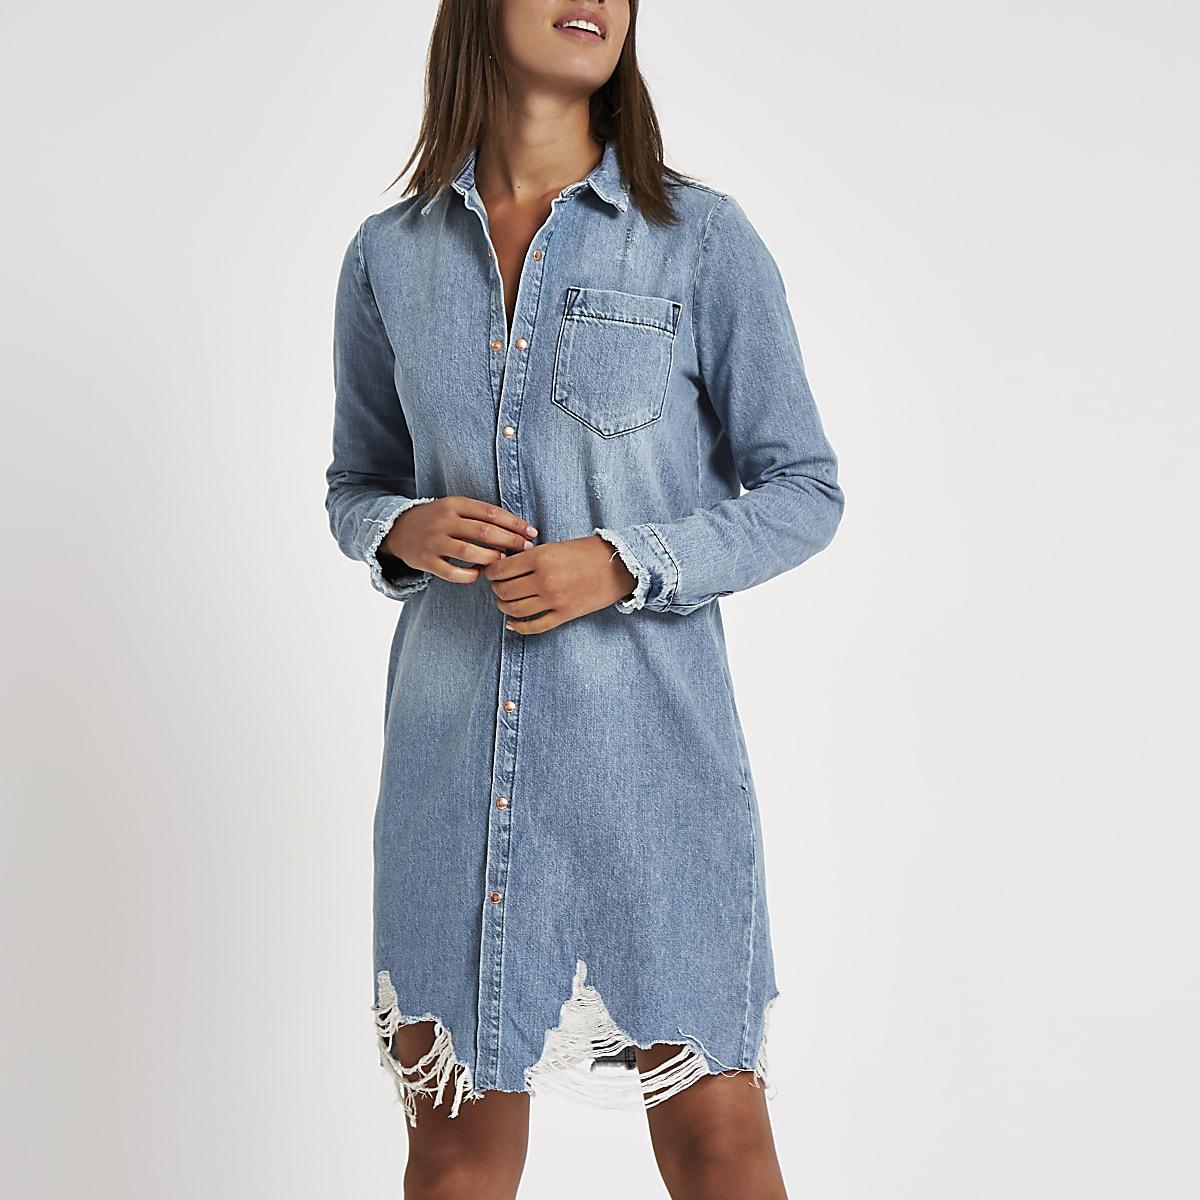 6d61b56f90 Blue ripped denim shirt dress - Shirt Dresses - Dresses - women